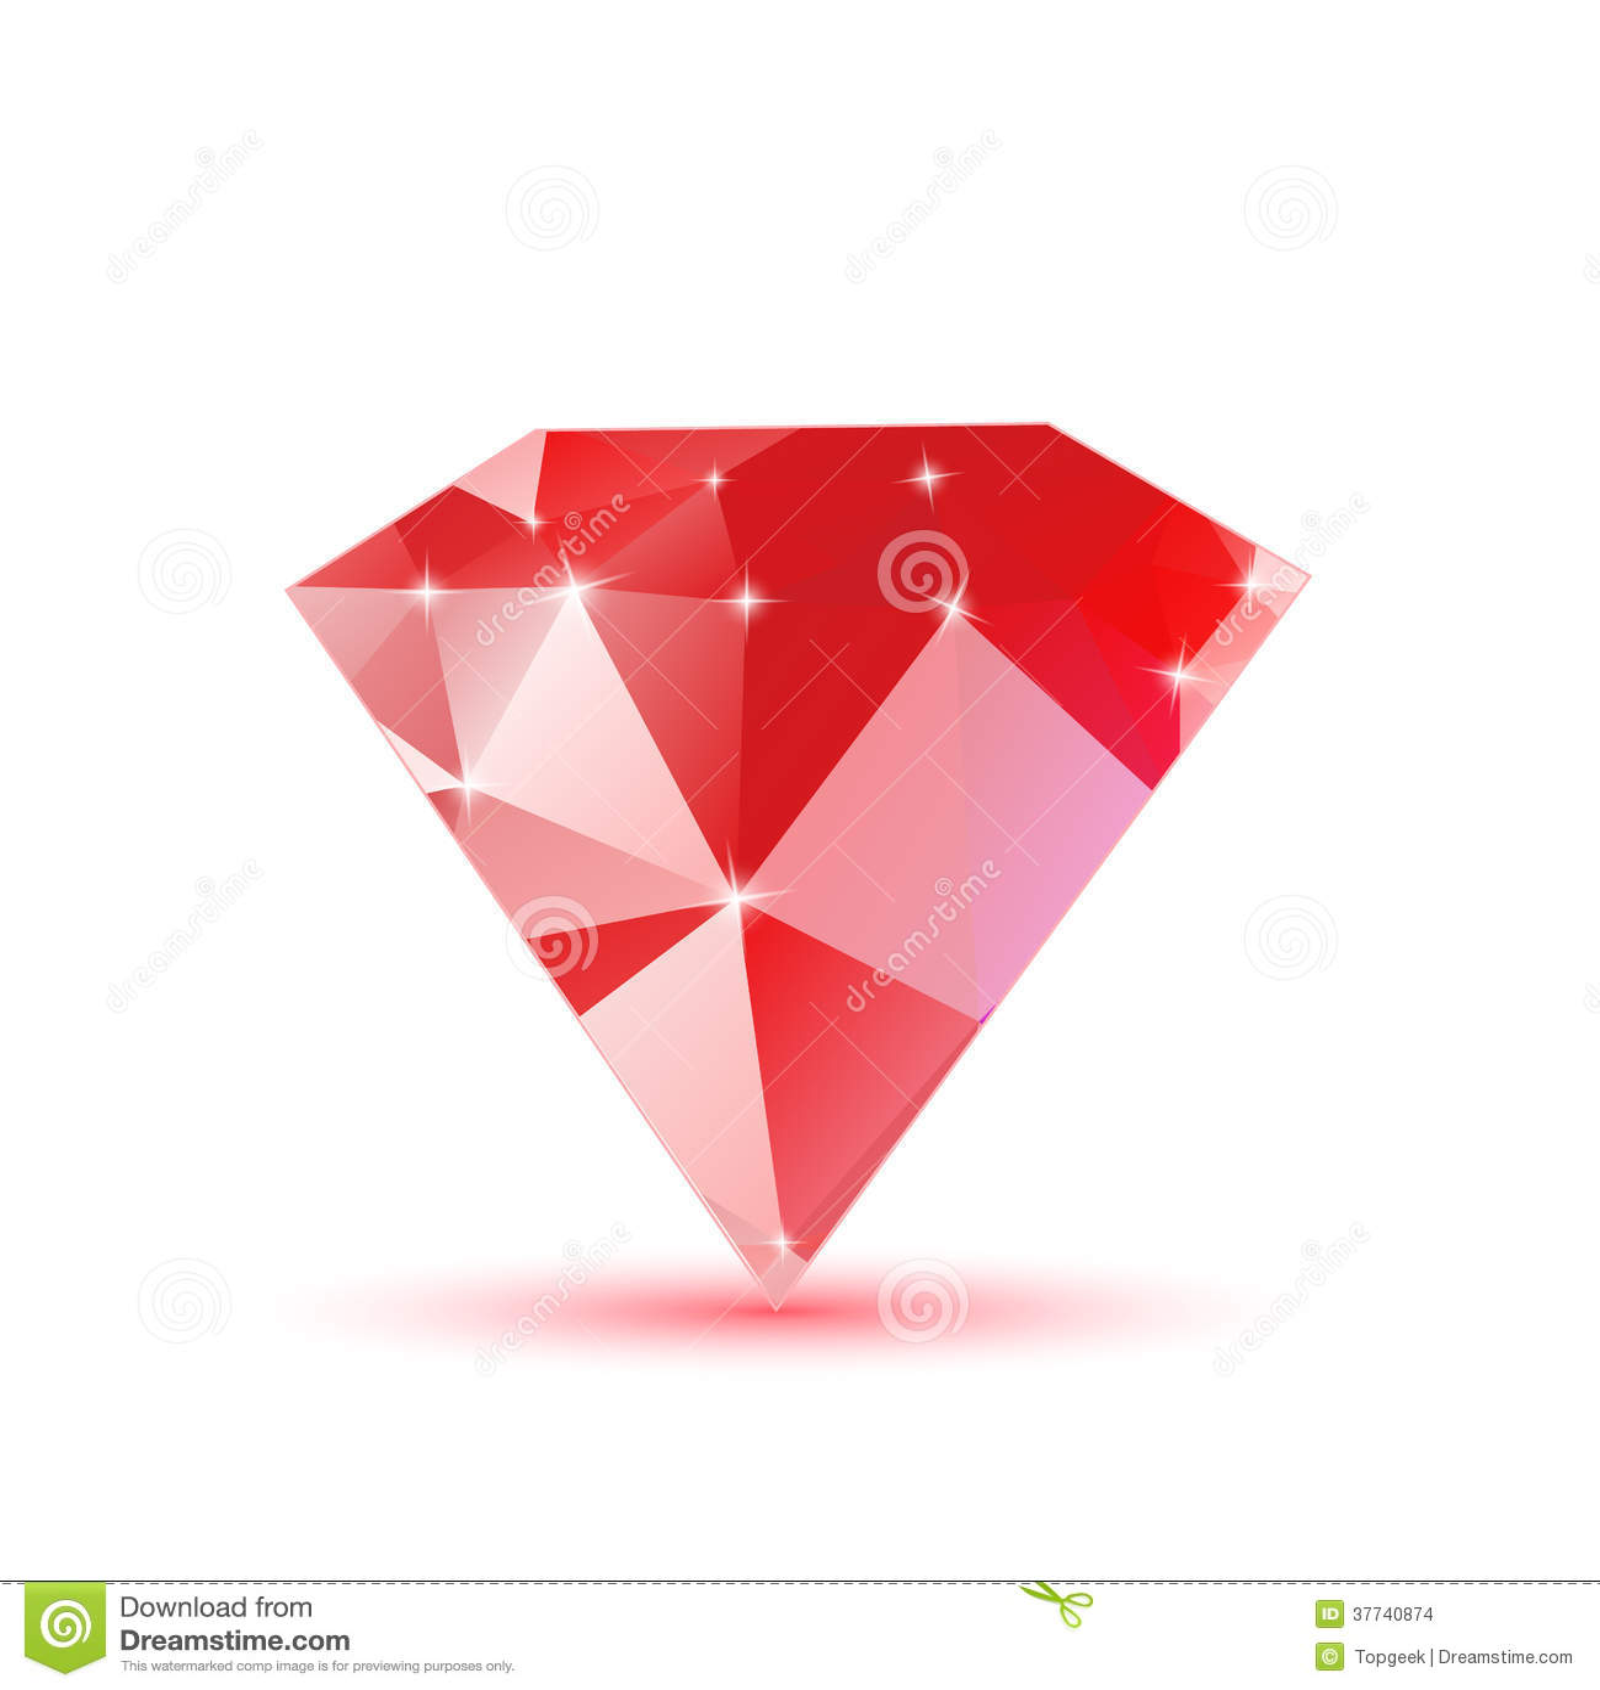 Diamond red triangular stock vector. Illustration of shape - 37740874